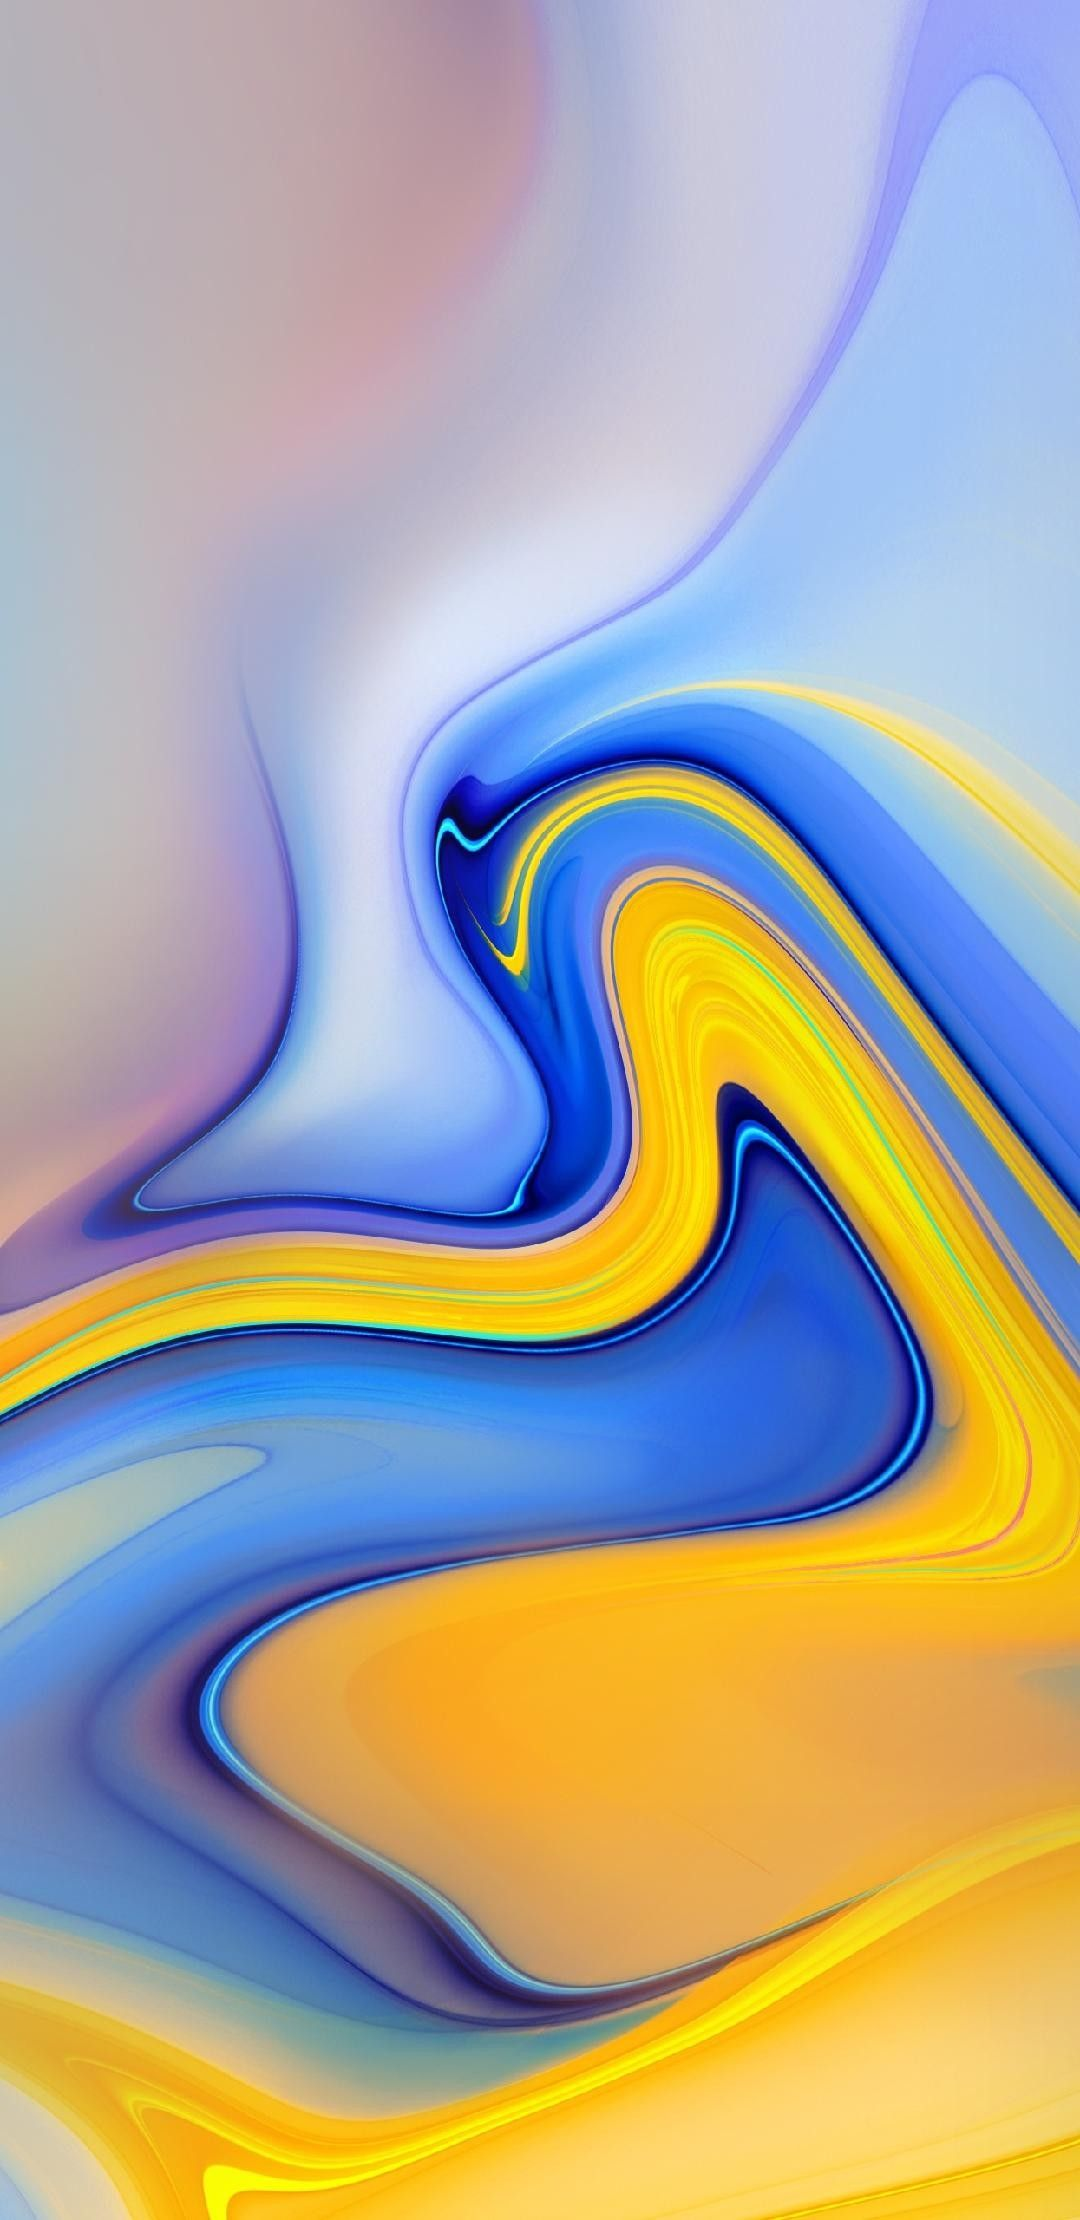 great walls Huawei wallpapers, Samsung galaxy wallpaper